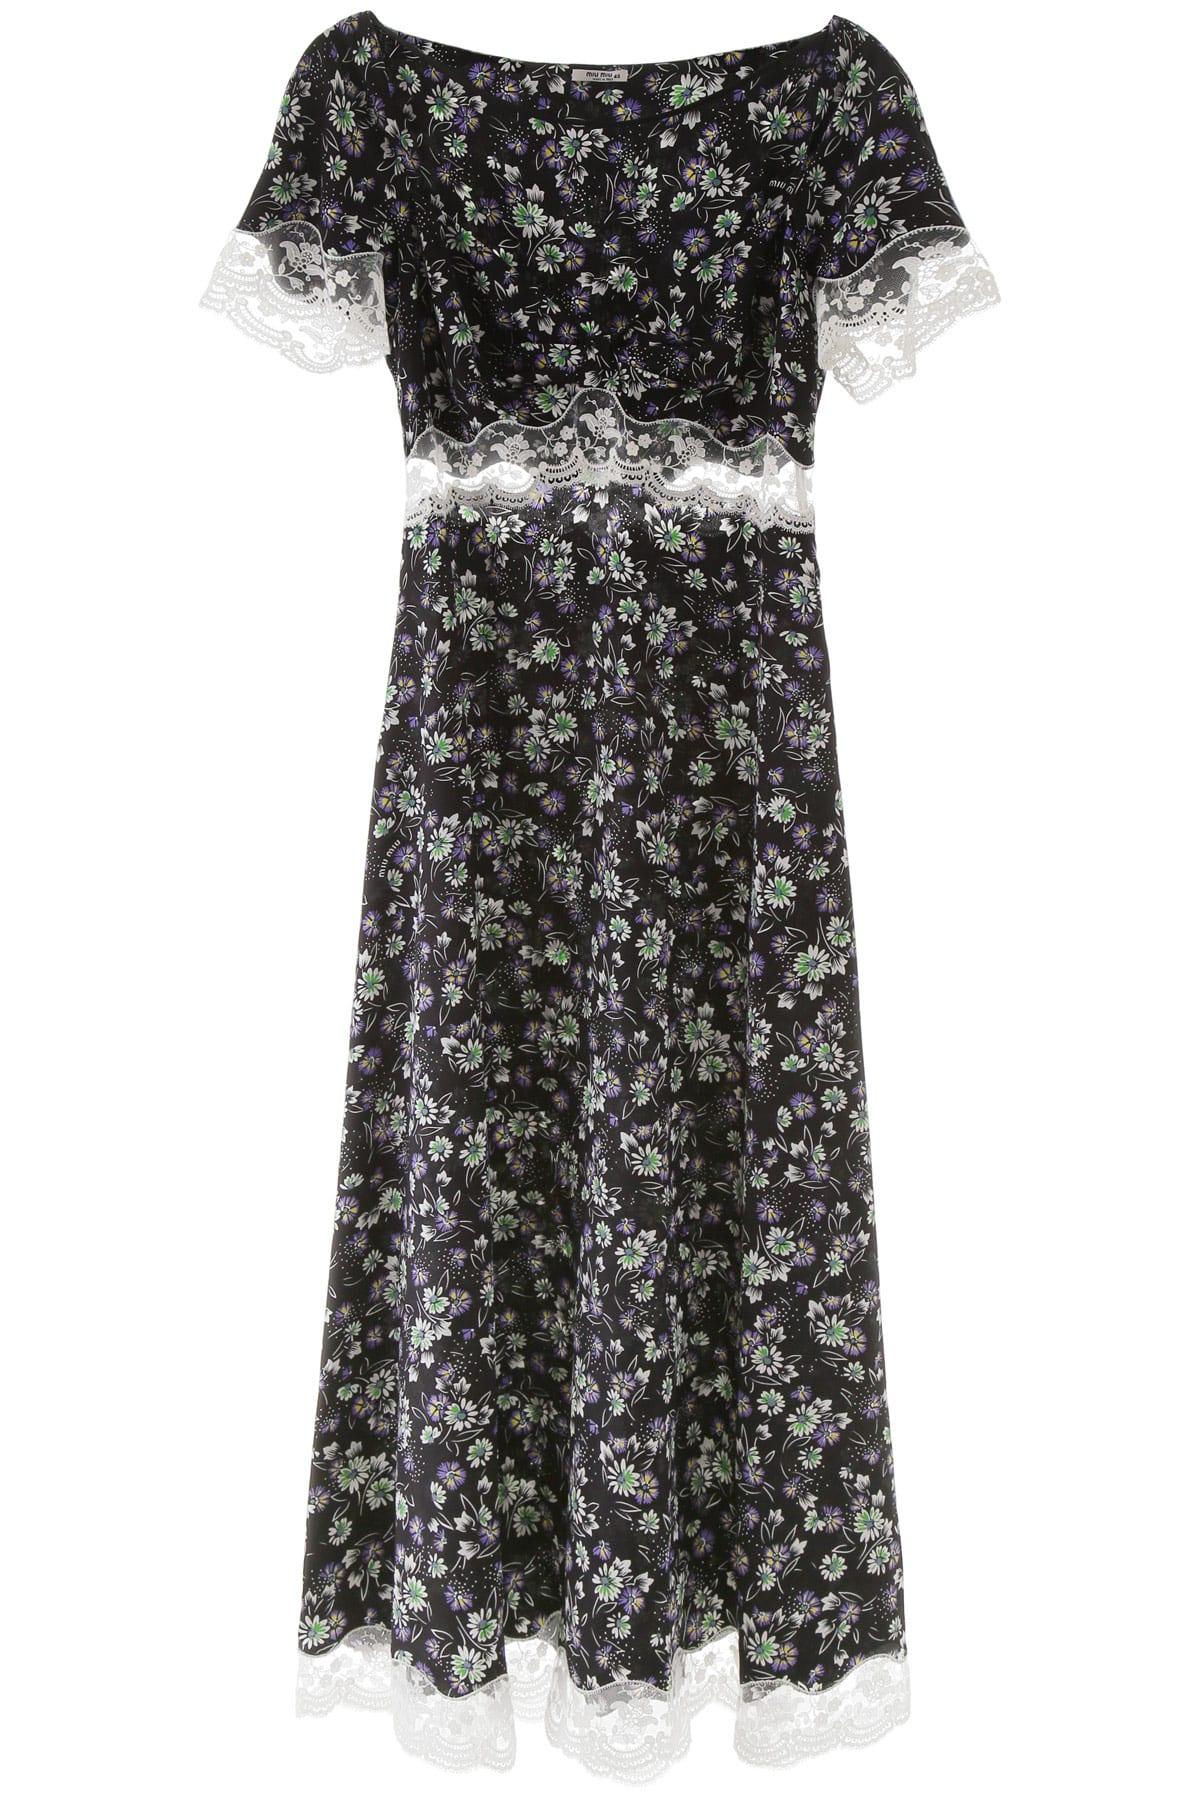 Buy Miu Miu Floral-printed Dress With Lace online, shop Miu Miu with free shipping